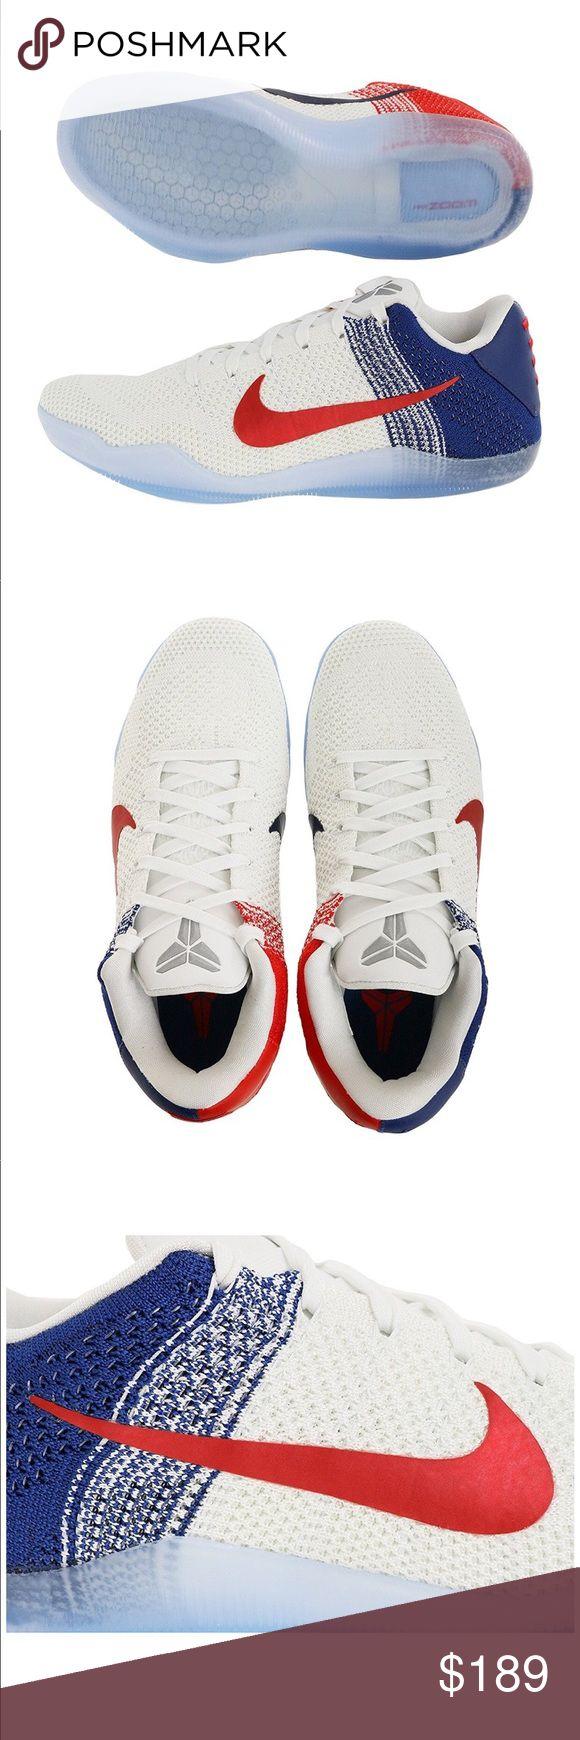 Nike Kobe XI Elite Low Mens Sneakers Shoes Brand new Nike Men's Kobe XI Elite Low, WHITE/UNIVERSITY RED-DEEP ROYAL BLUE fabric Model Number: 822675184 Gender: mens Color: WHITE/UNIVERSITY RED-DEEP ROYAL BLUE Nike Shoes Sneakers